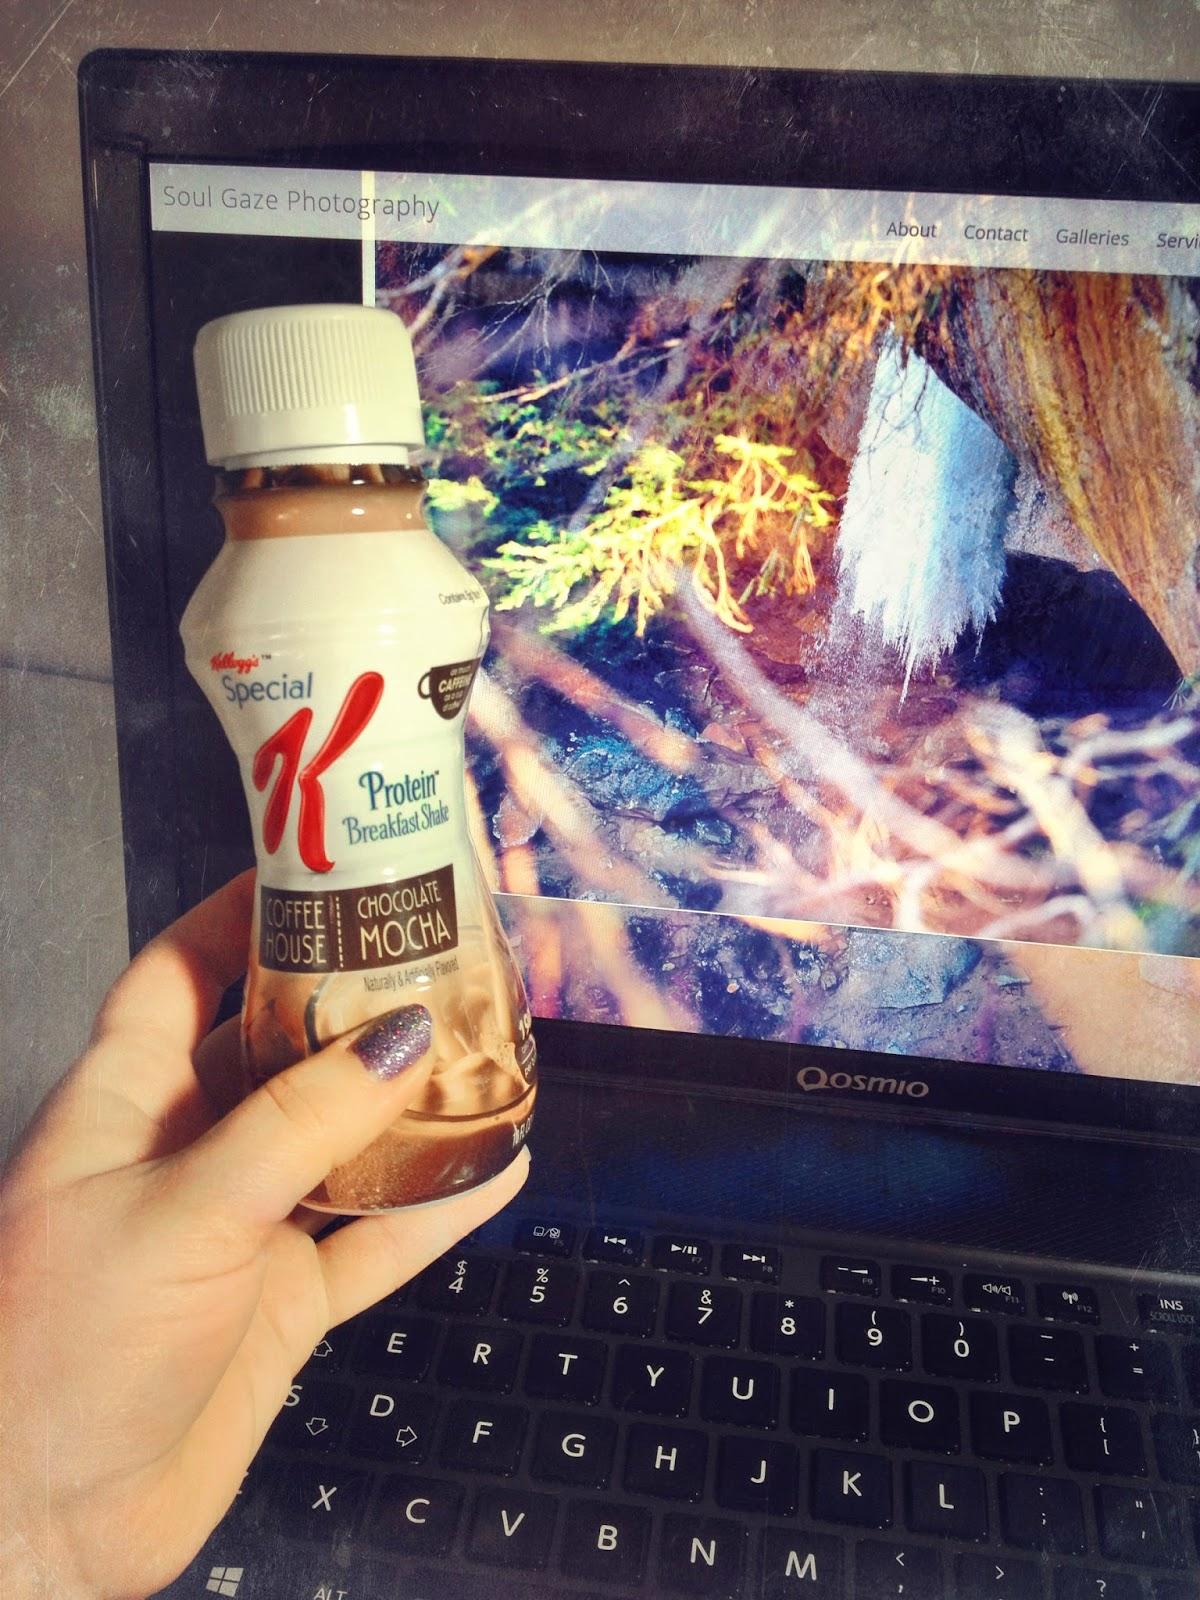 Special+K+Coffee+House+Chocolate+Mocha.jpg